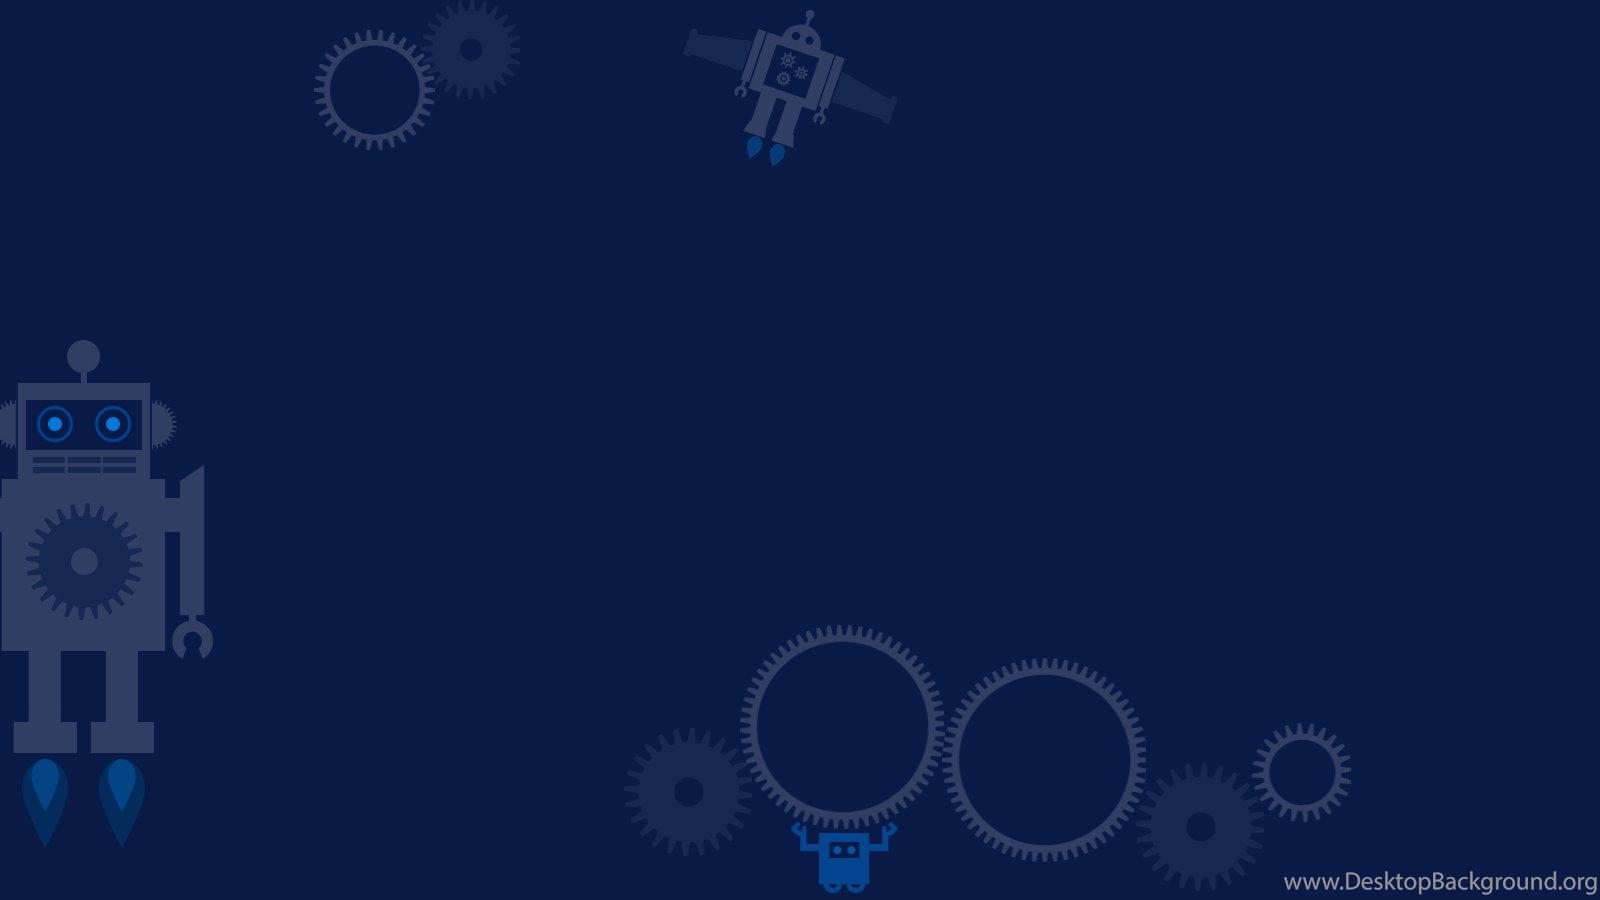 Windows 8 1 Backgrounds Robots By Ntim007 On Deviantart Desktop